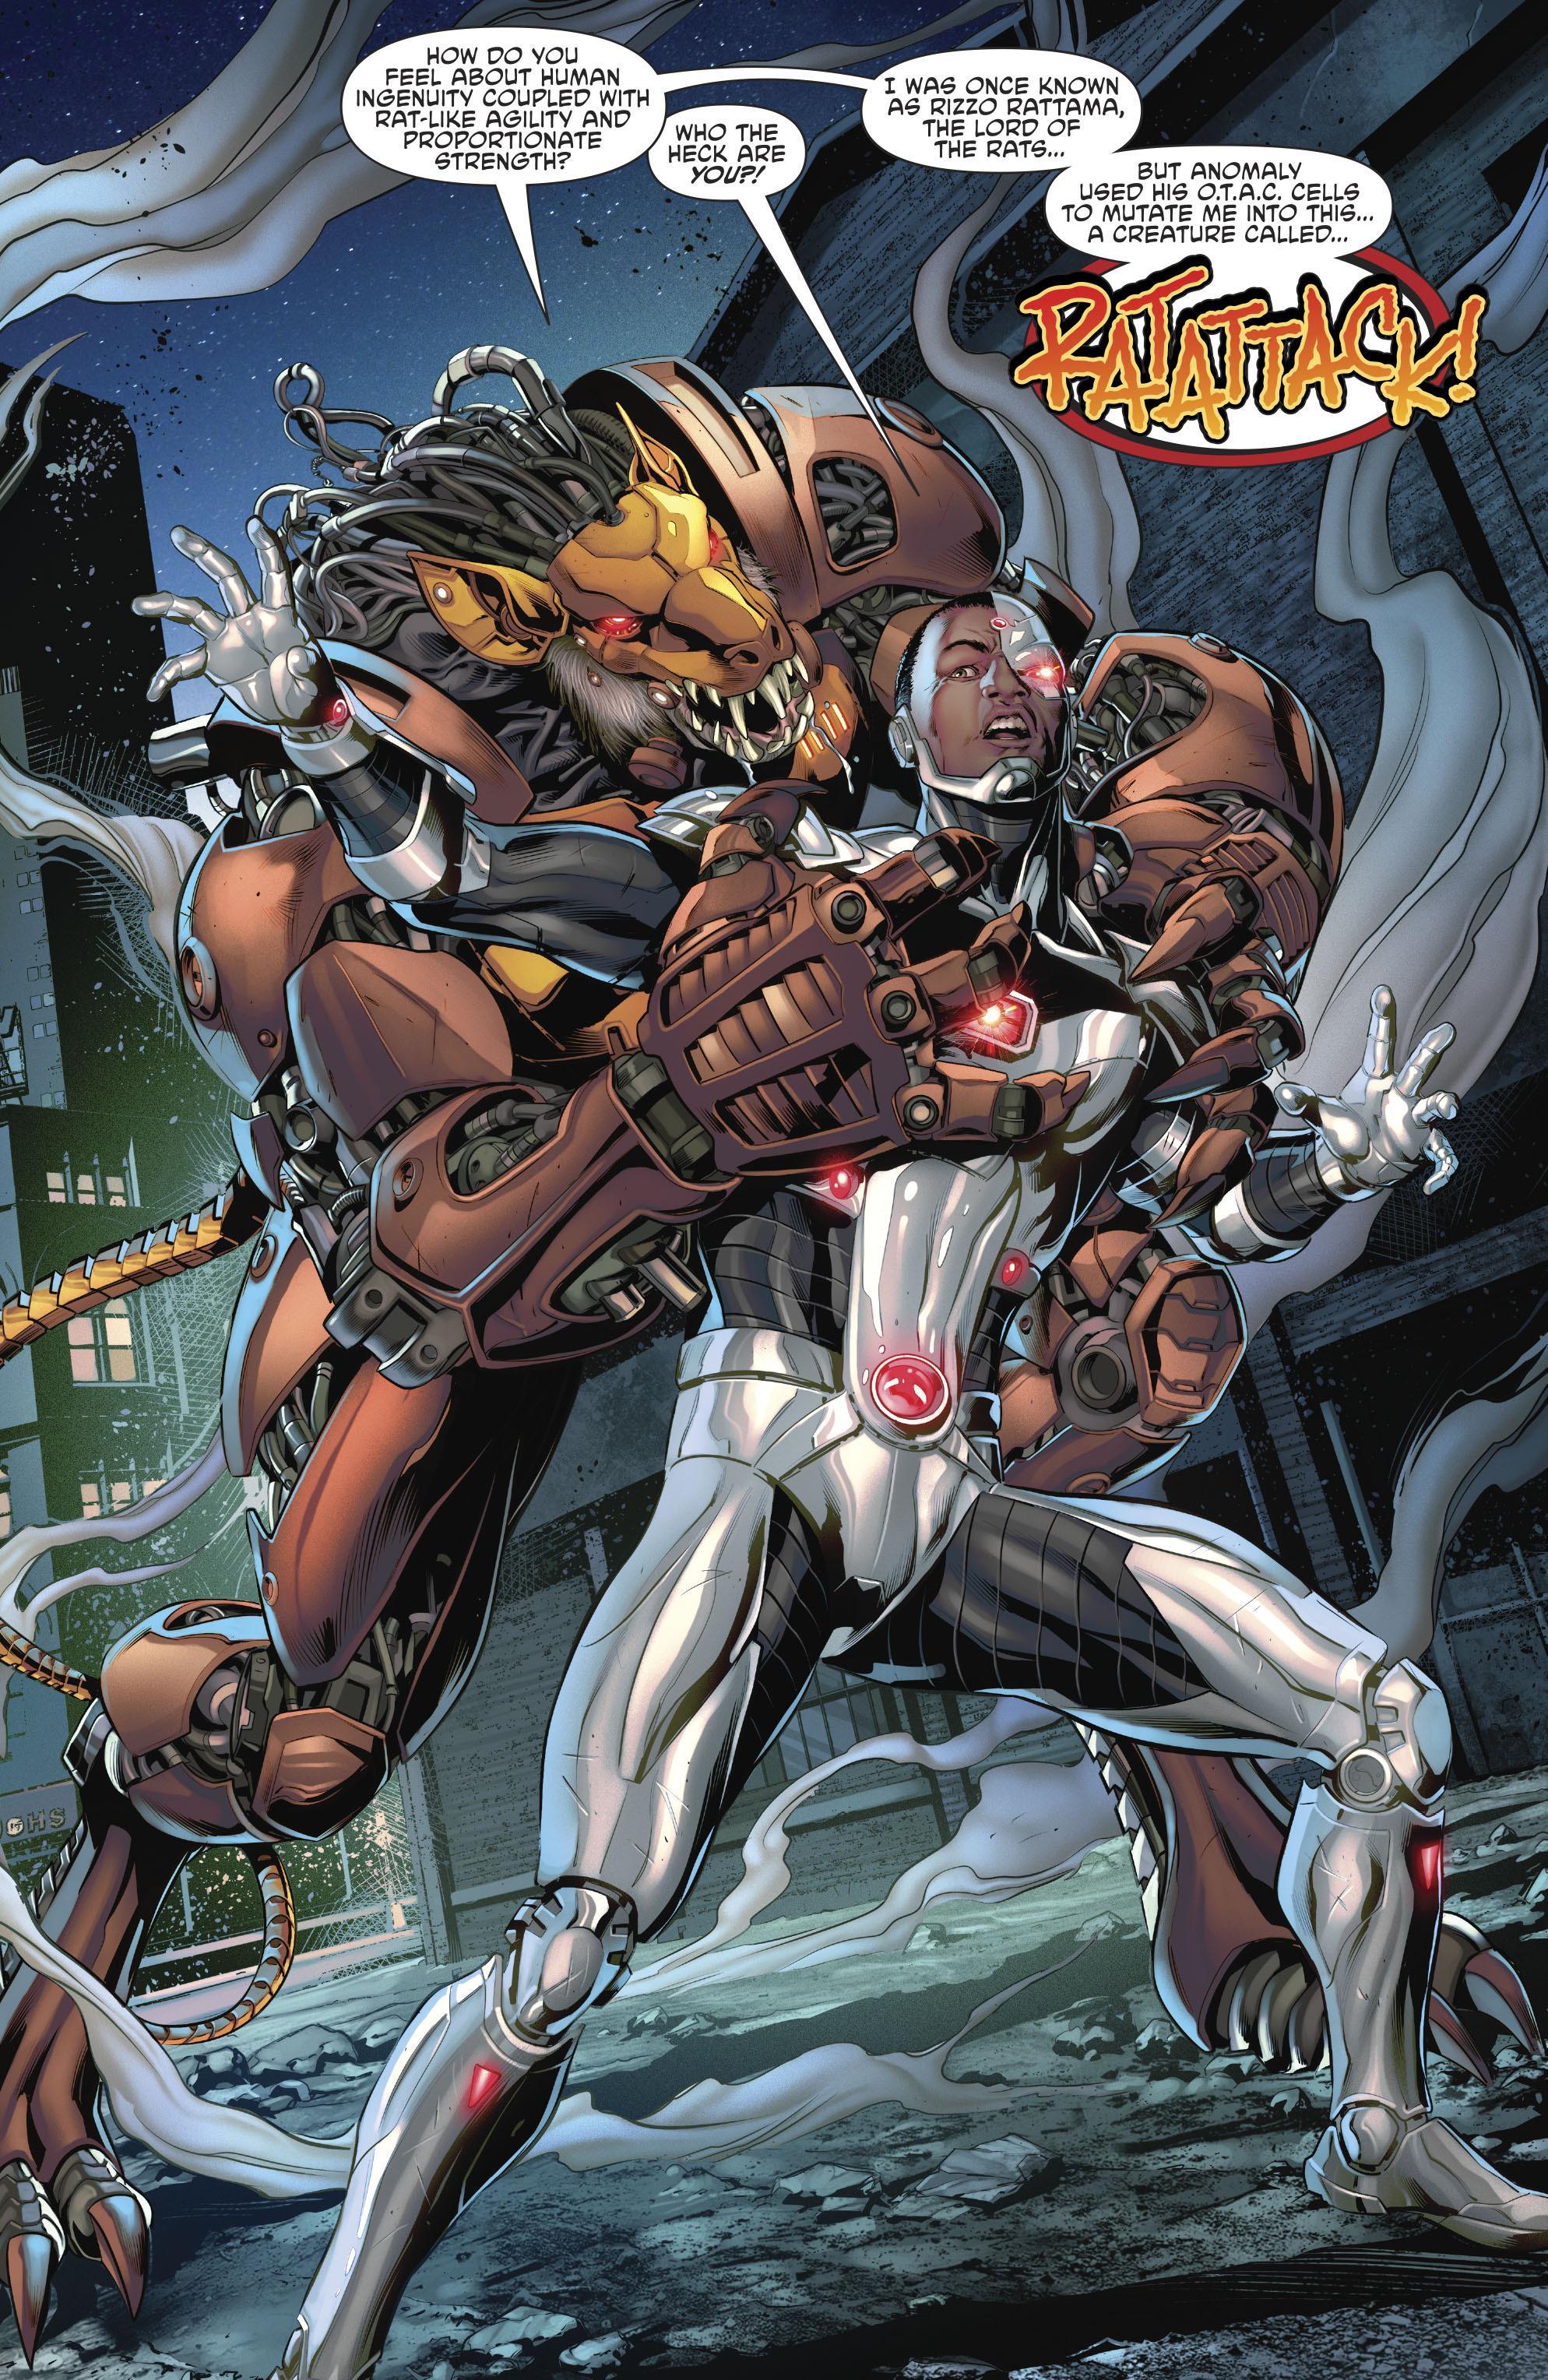 Cyborg Danger in Detroit review